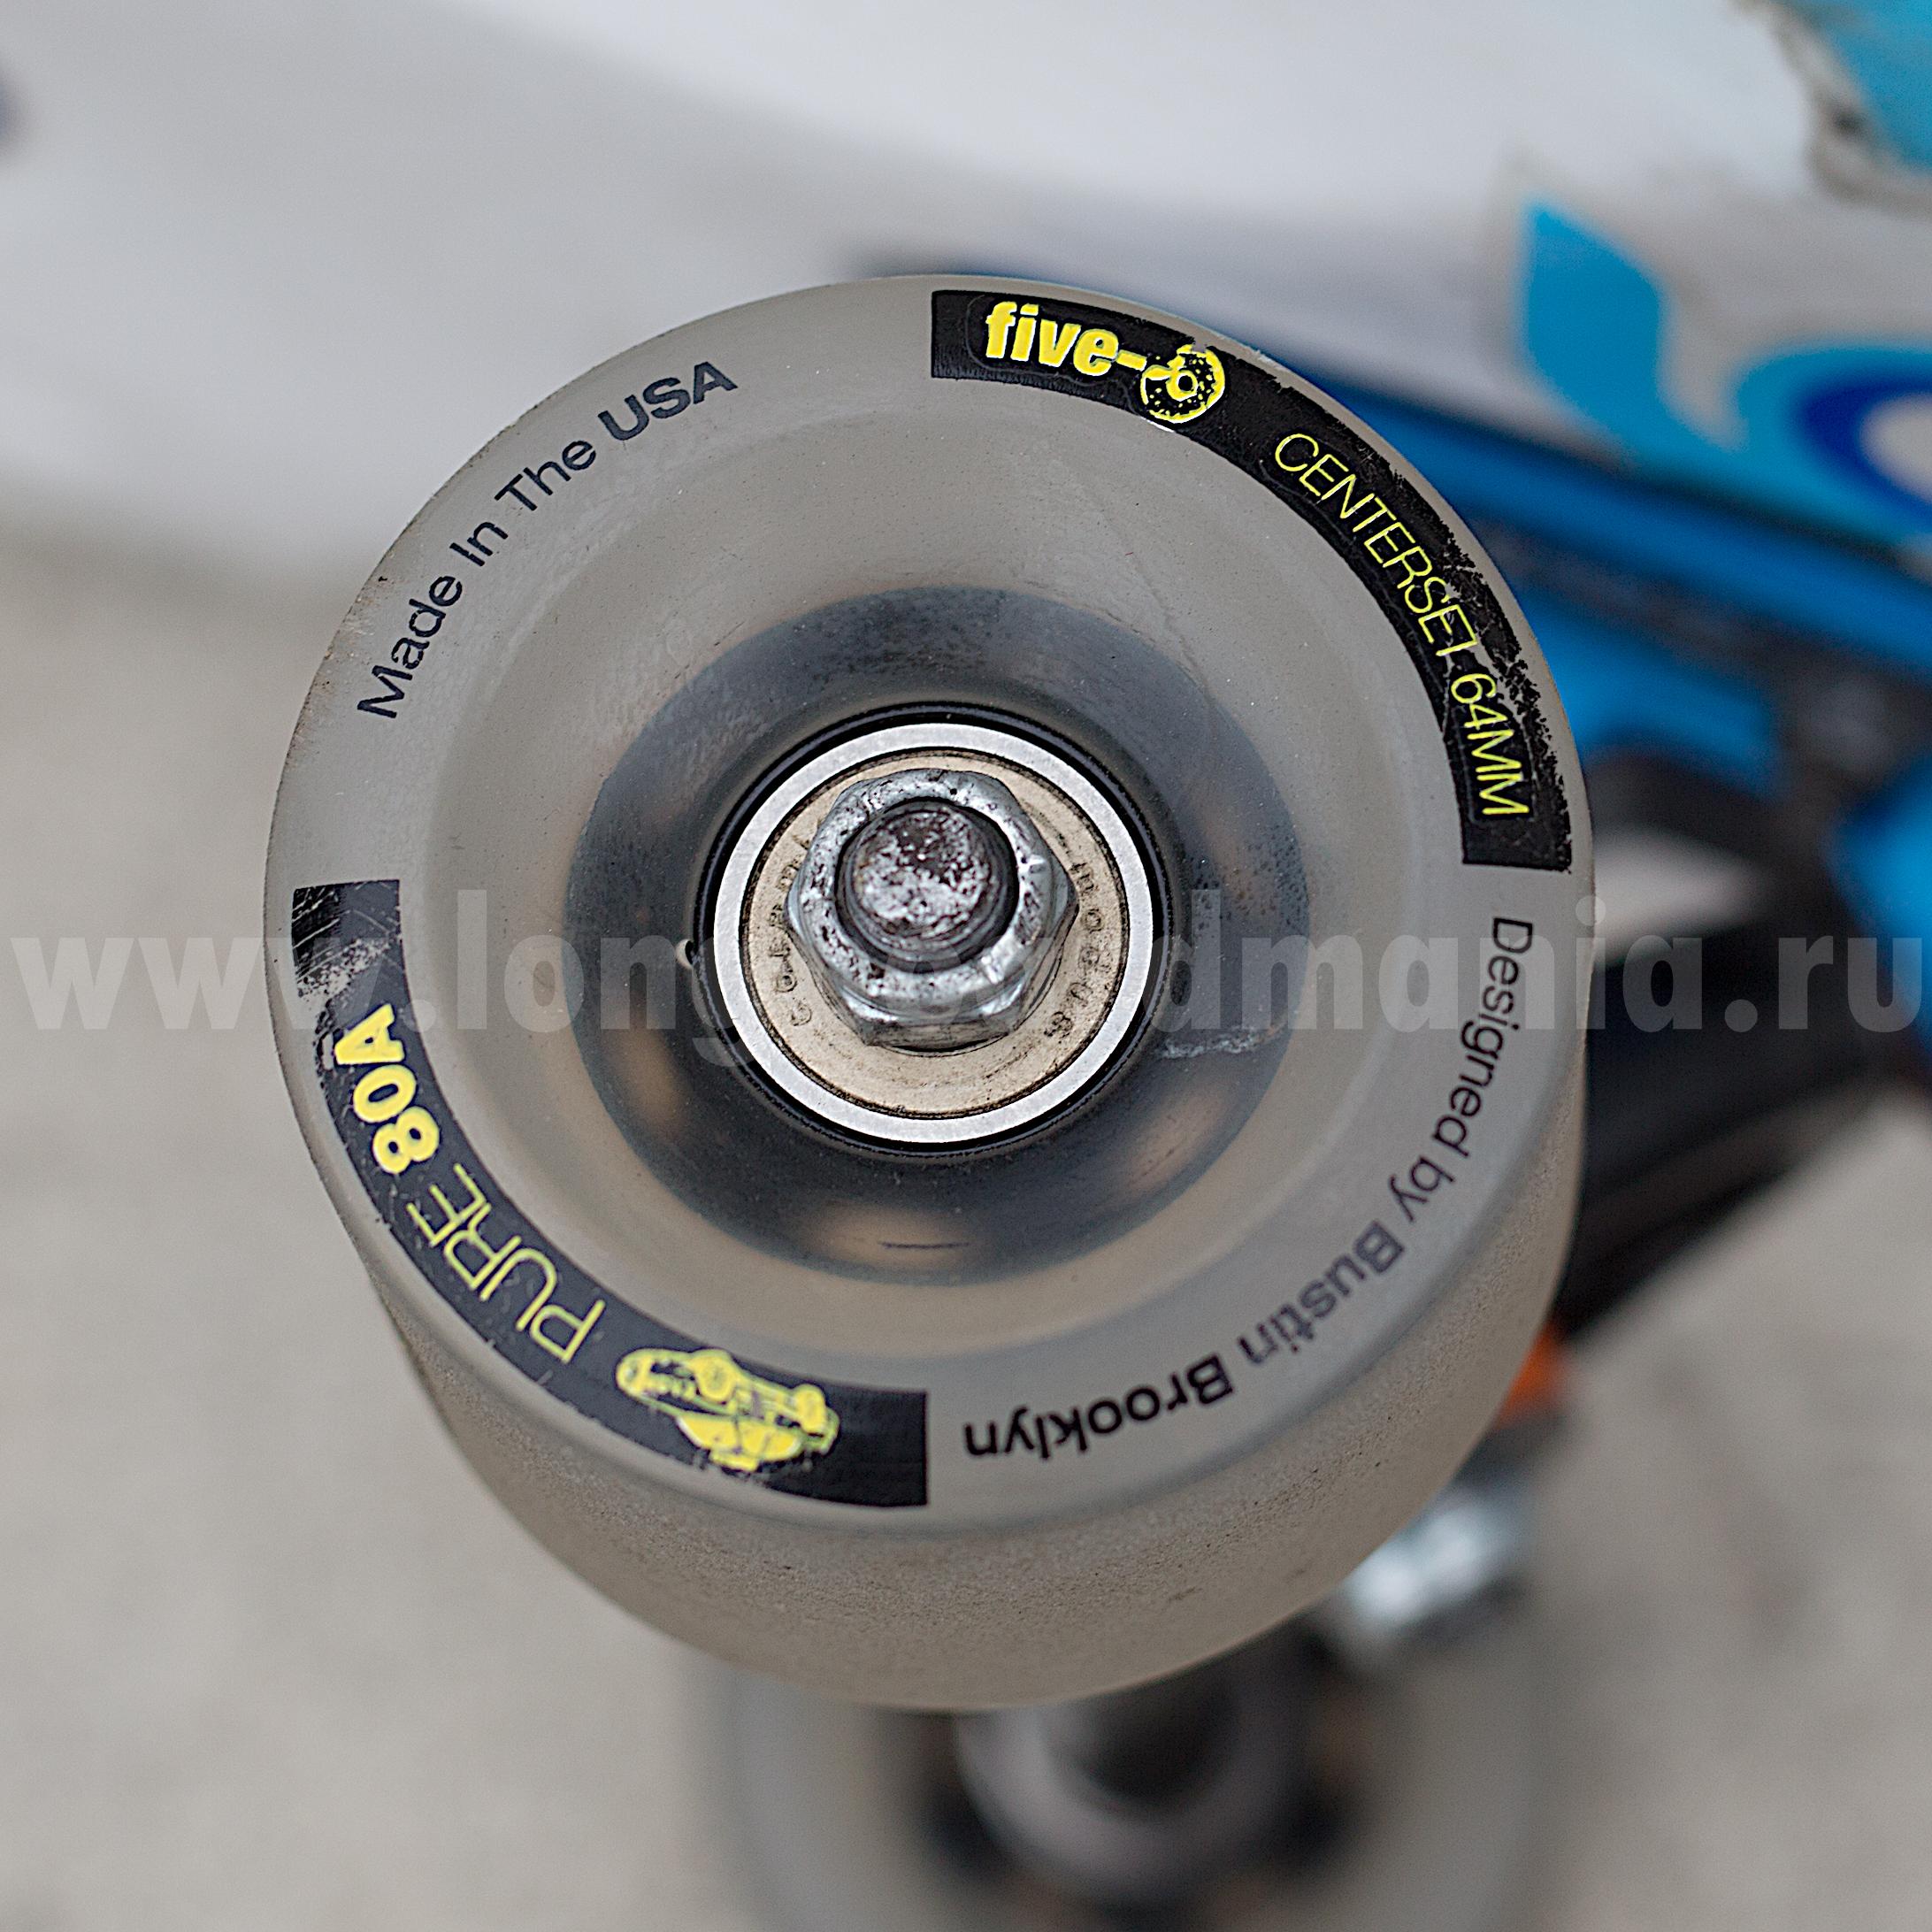 """Bustin - Five-O Wheels"" - longboardmania.ru"